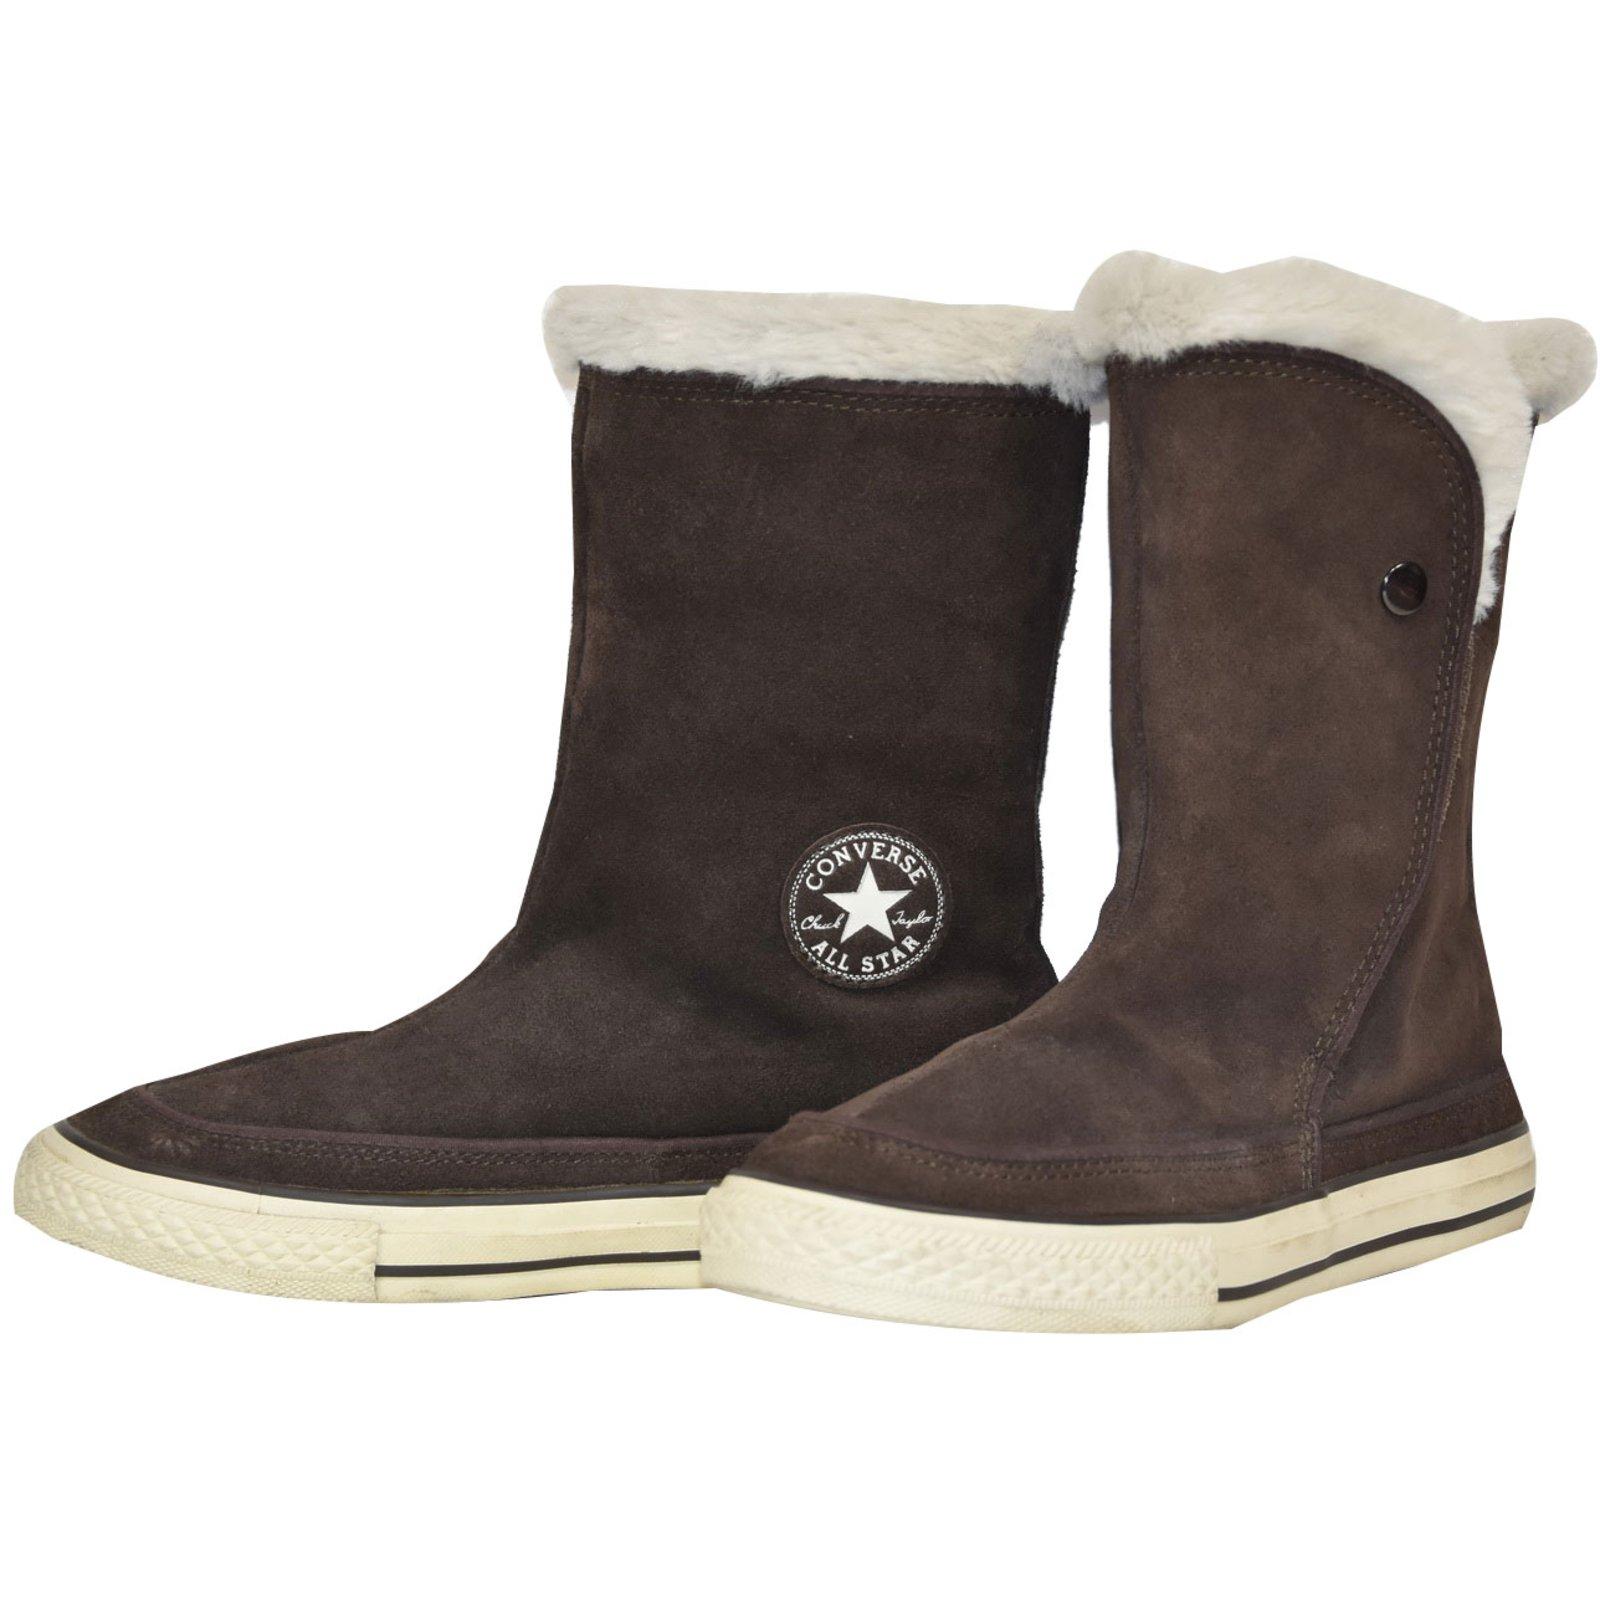 converse boot